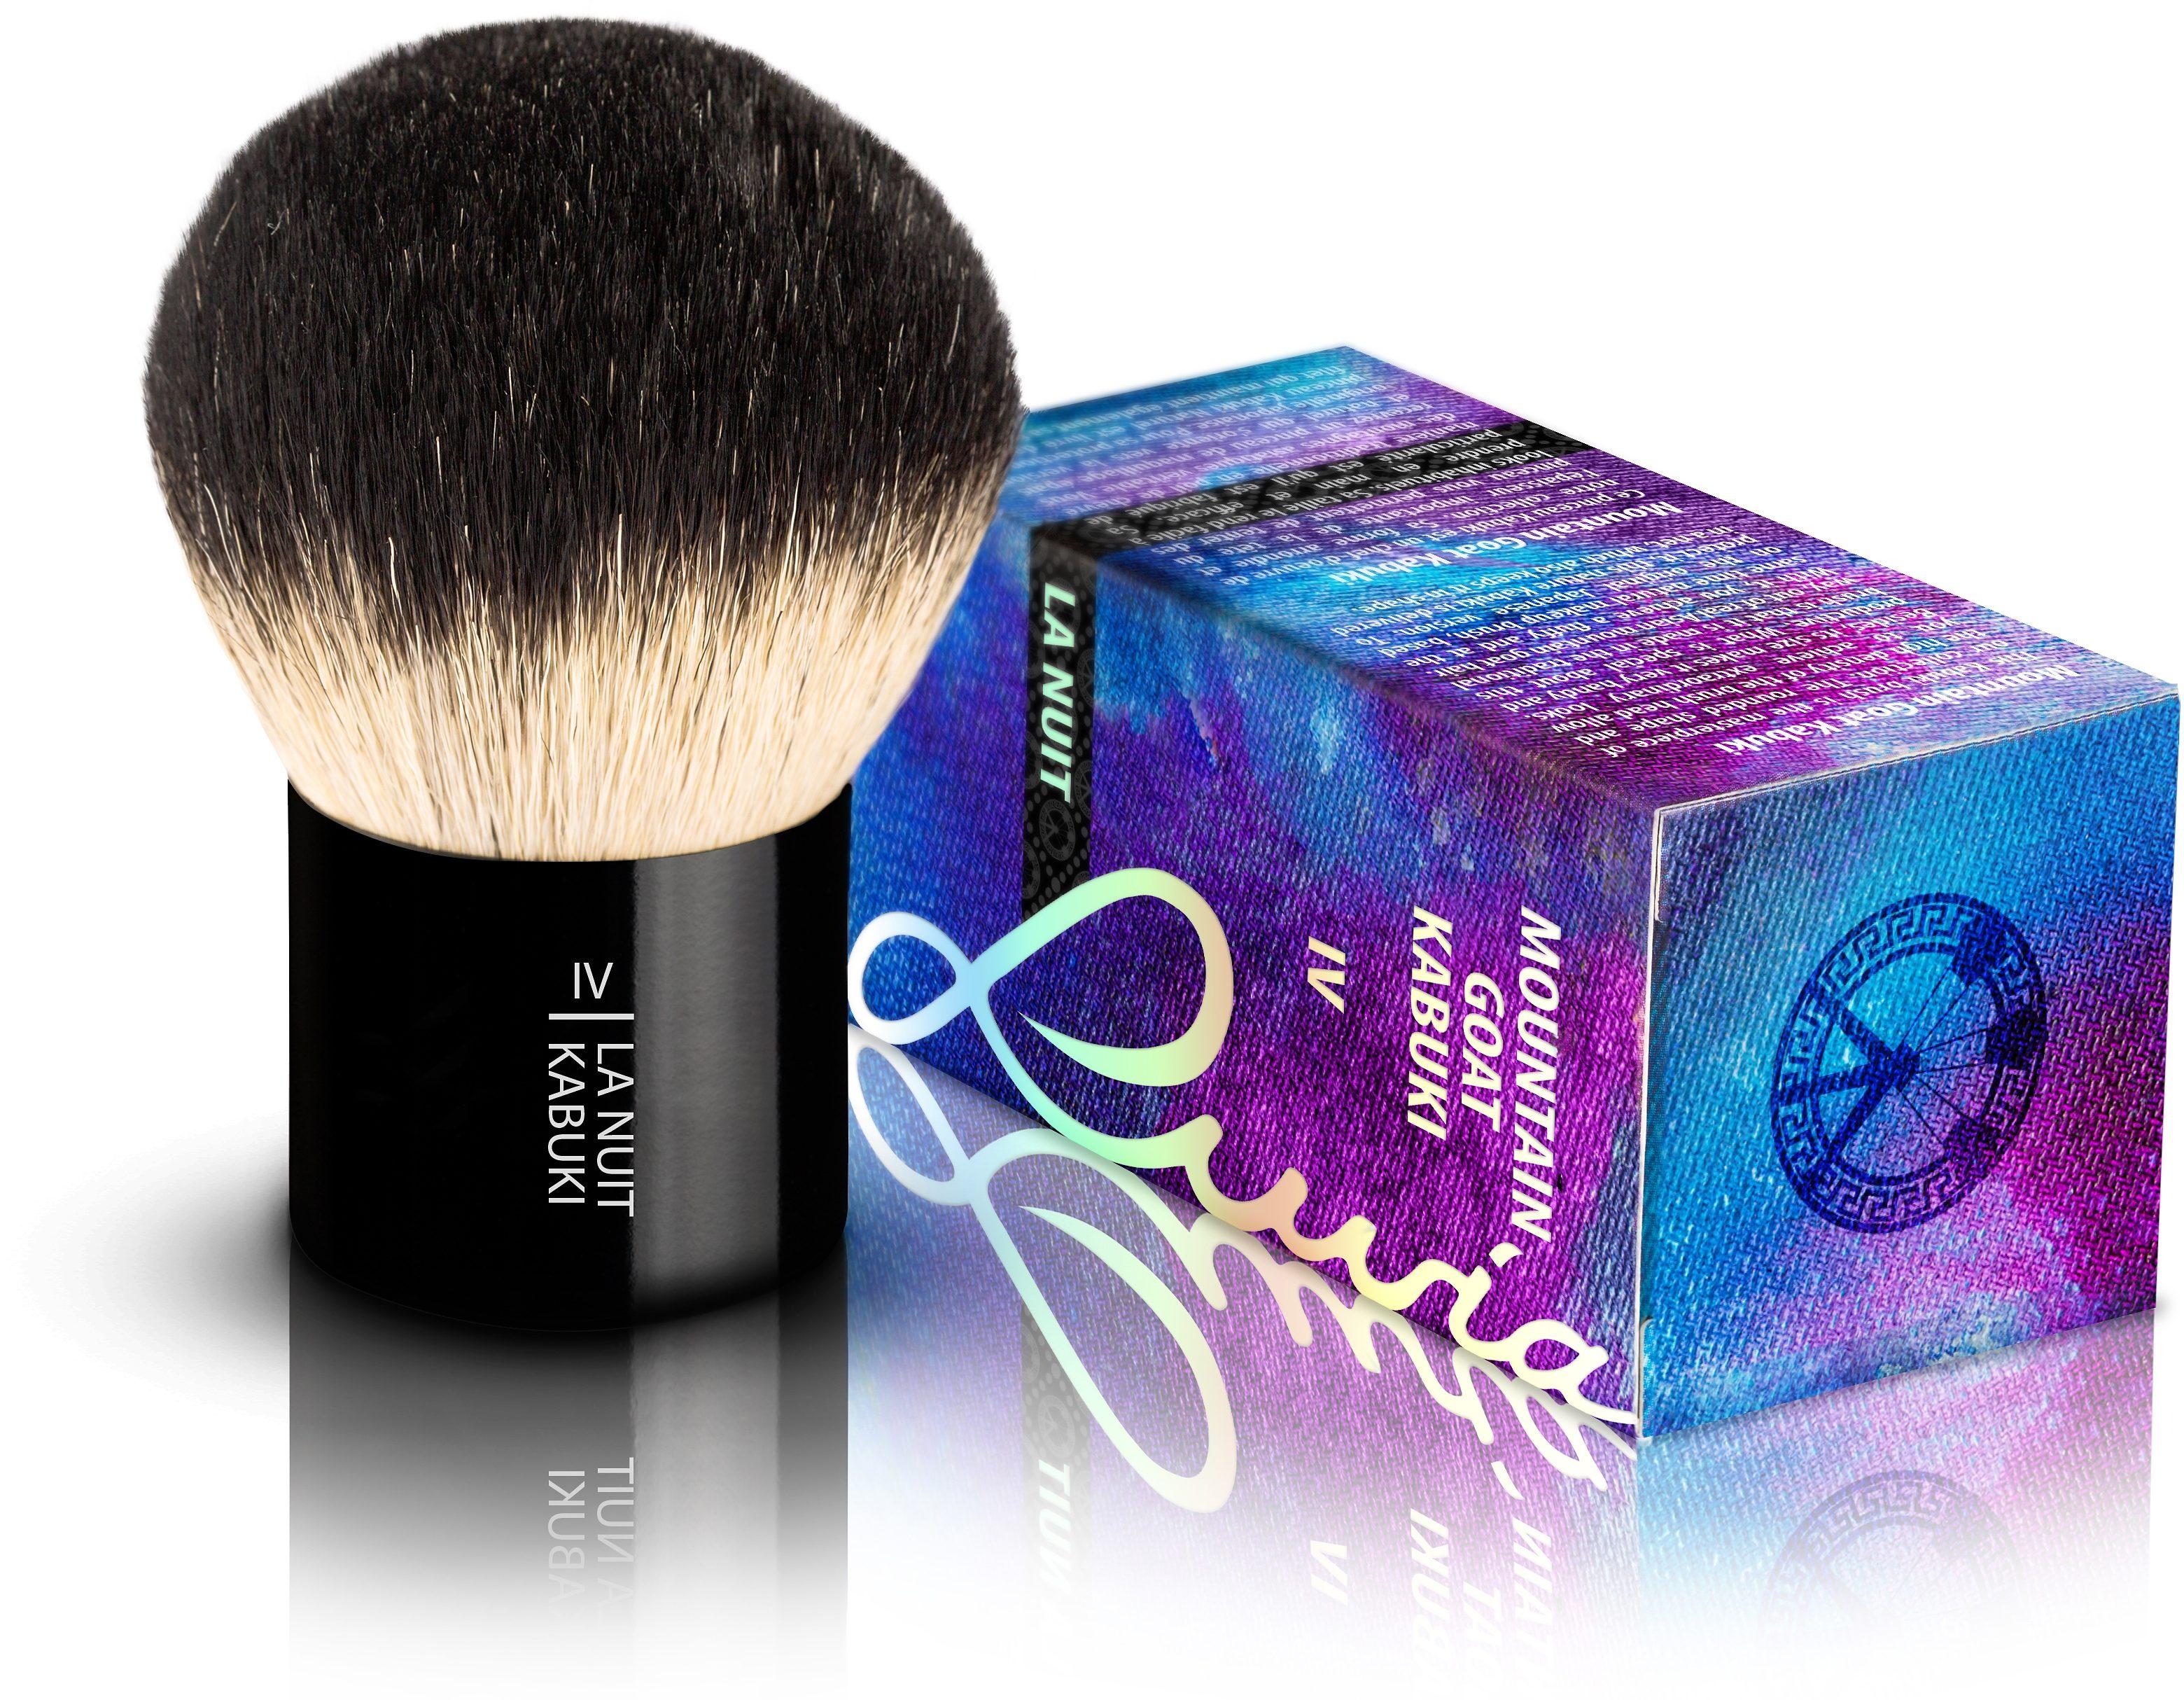 Luvia Cosmetics, »La Nuit - IV Mountain Goat Kabuki«, Naturhaar-Kabuki Kosmetikpinsel